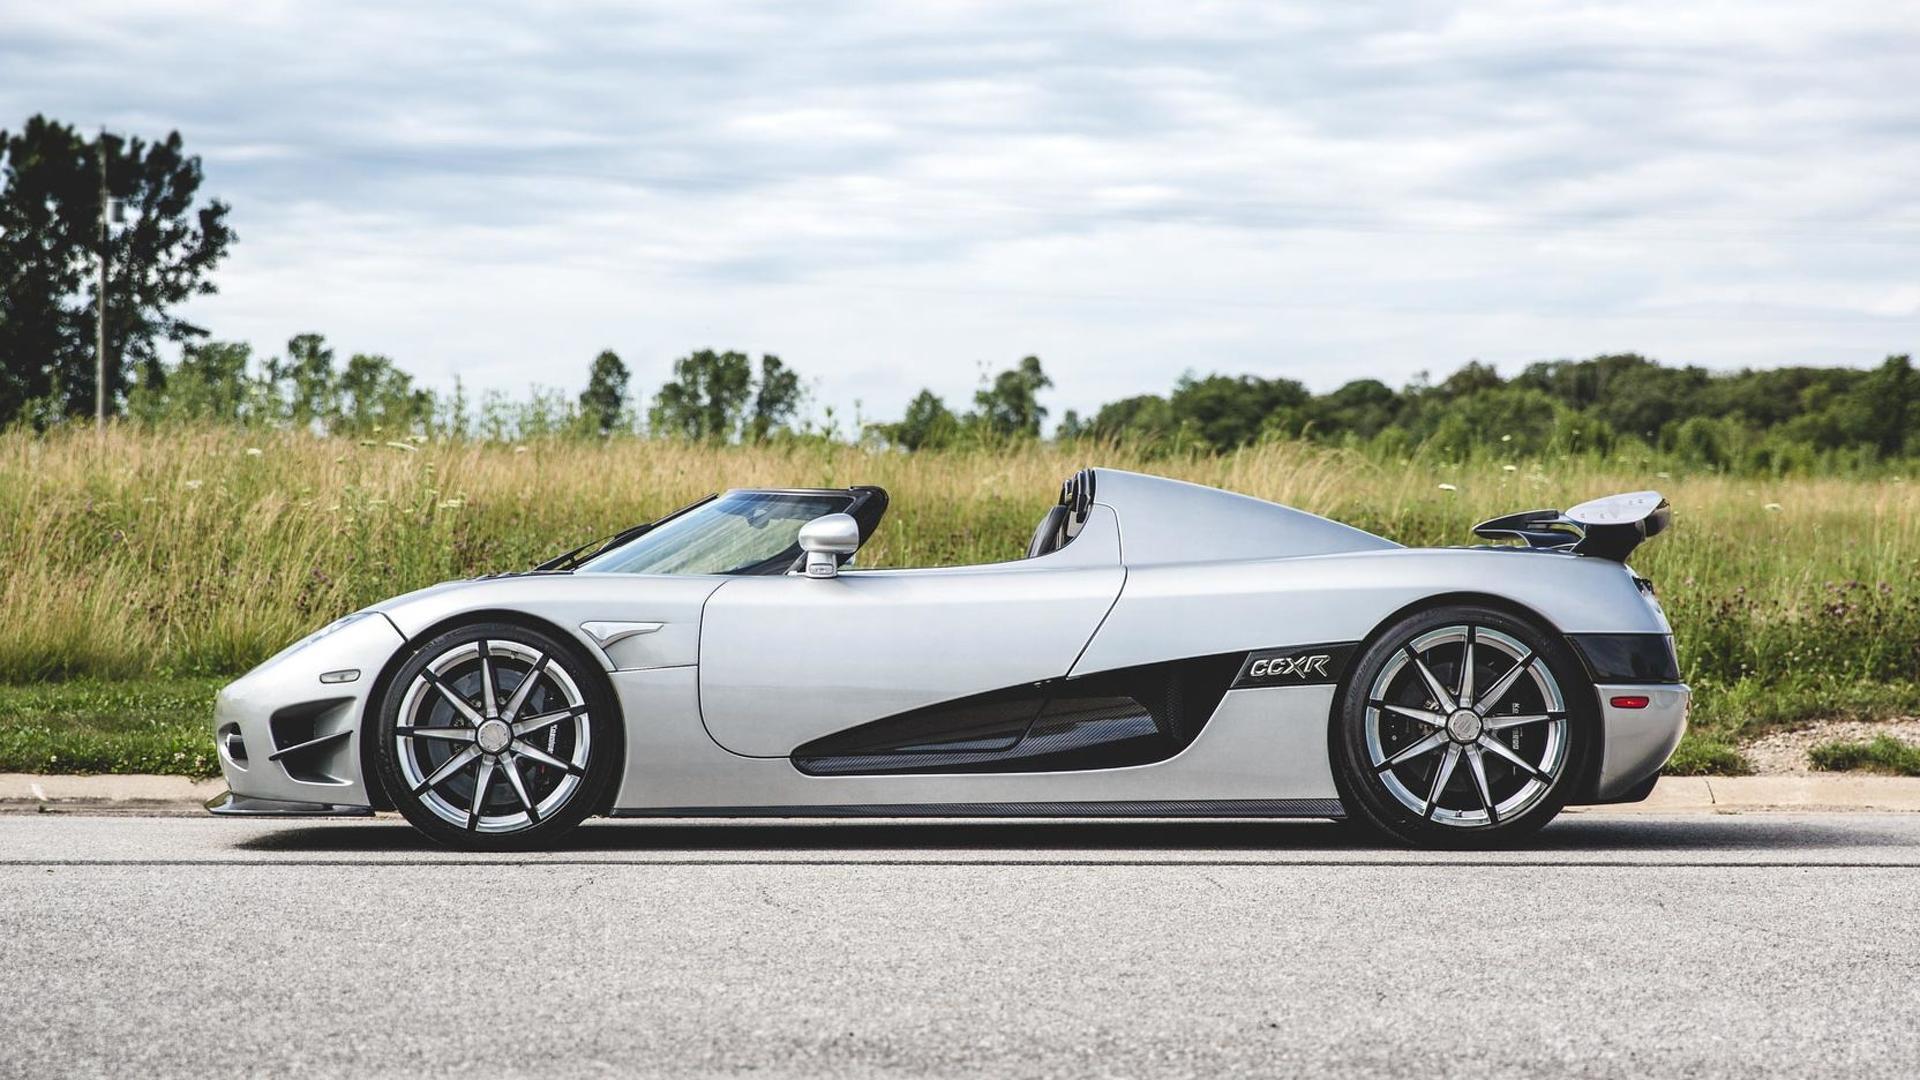 Koenigsegg Ccxr Trevita >> Floyd Mayweather S Koenigsegg Ccxr Trevita Up For Auction Update